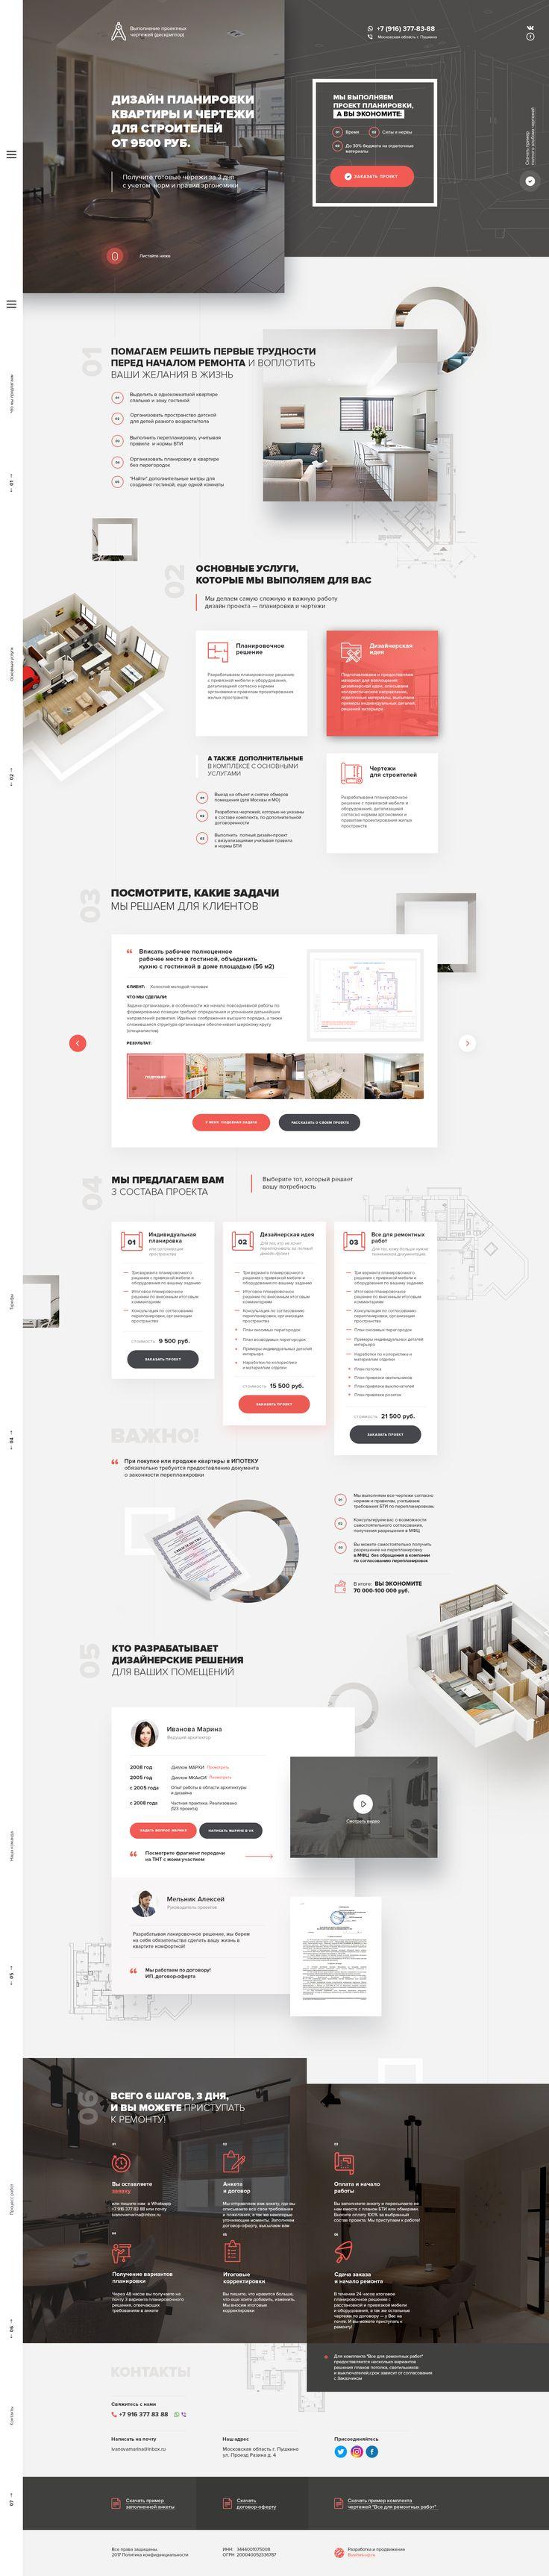 Лендинг. Дизайн, ремонт и чертежи. Диз. Егоров Александр / Landing page design by Alex Egorov